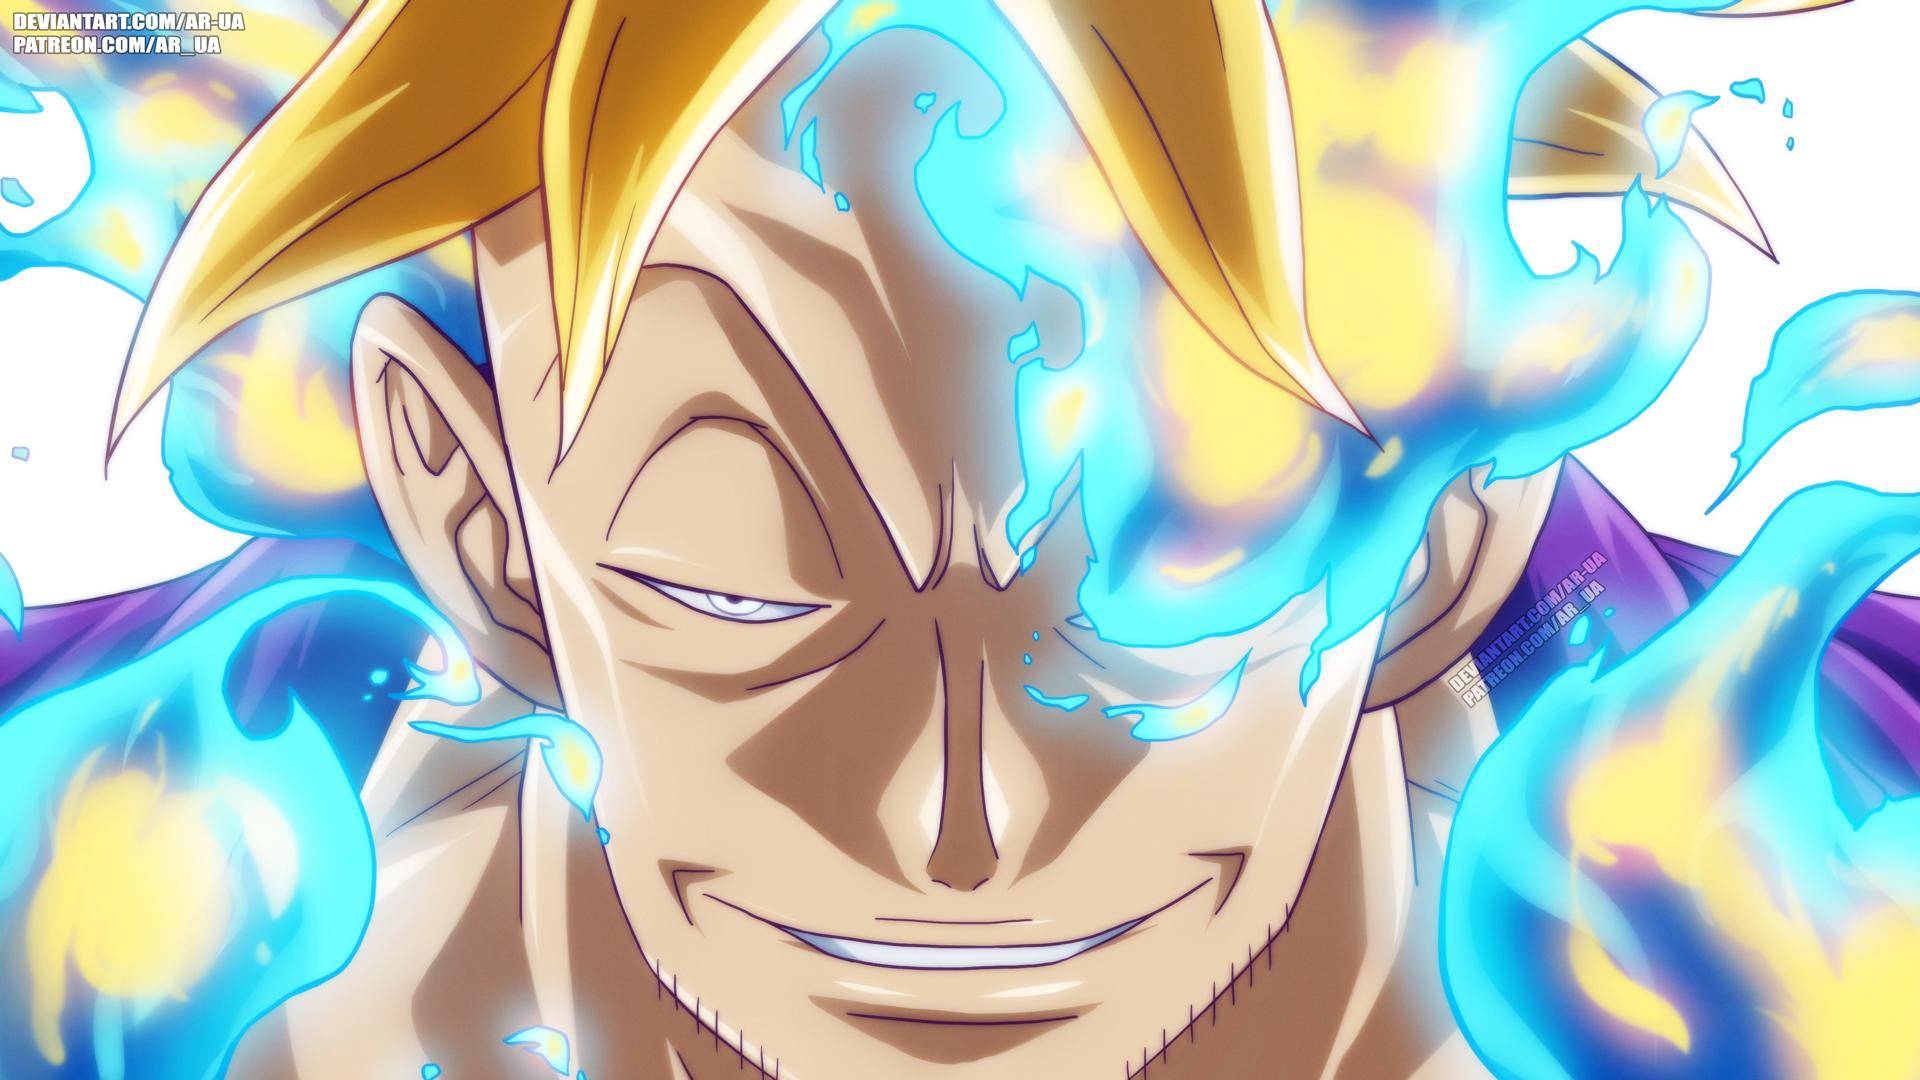 One Piece Fond d'écran HD   Arrière-Plan   1920x1080   ID:976356 - Wallpaper Abyss